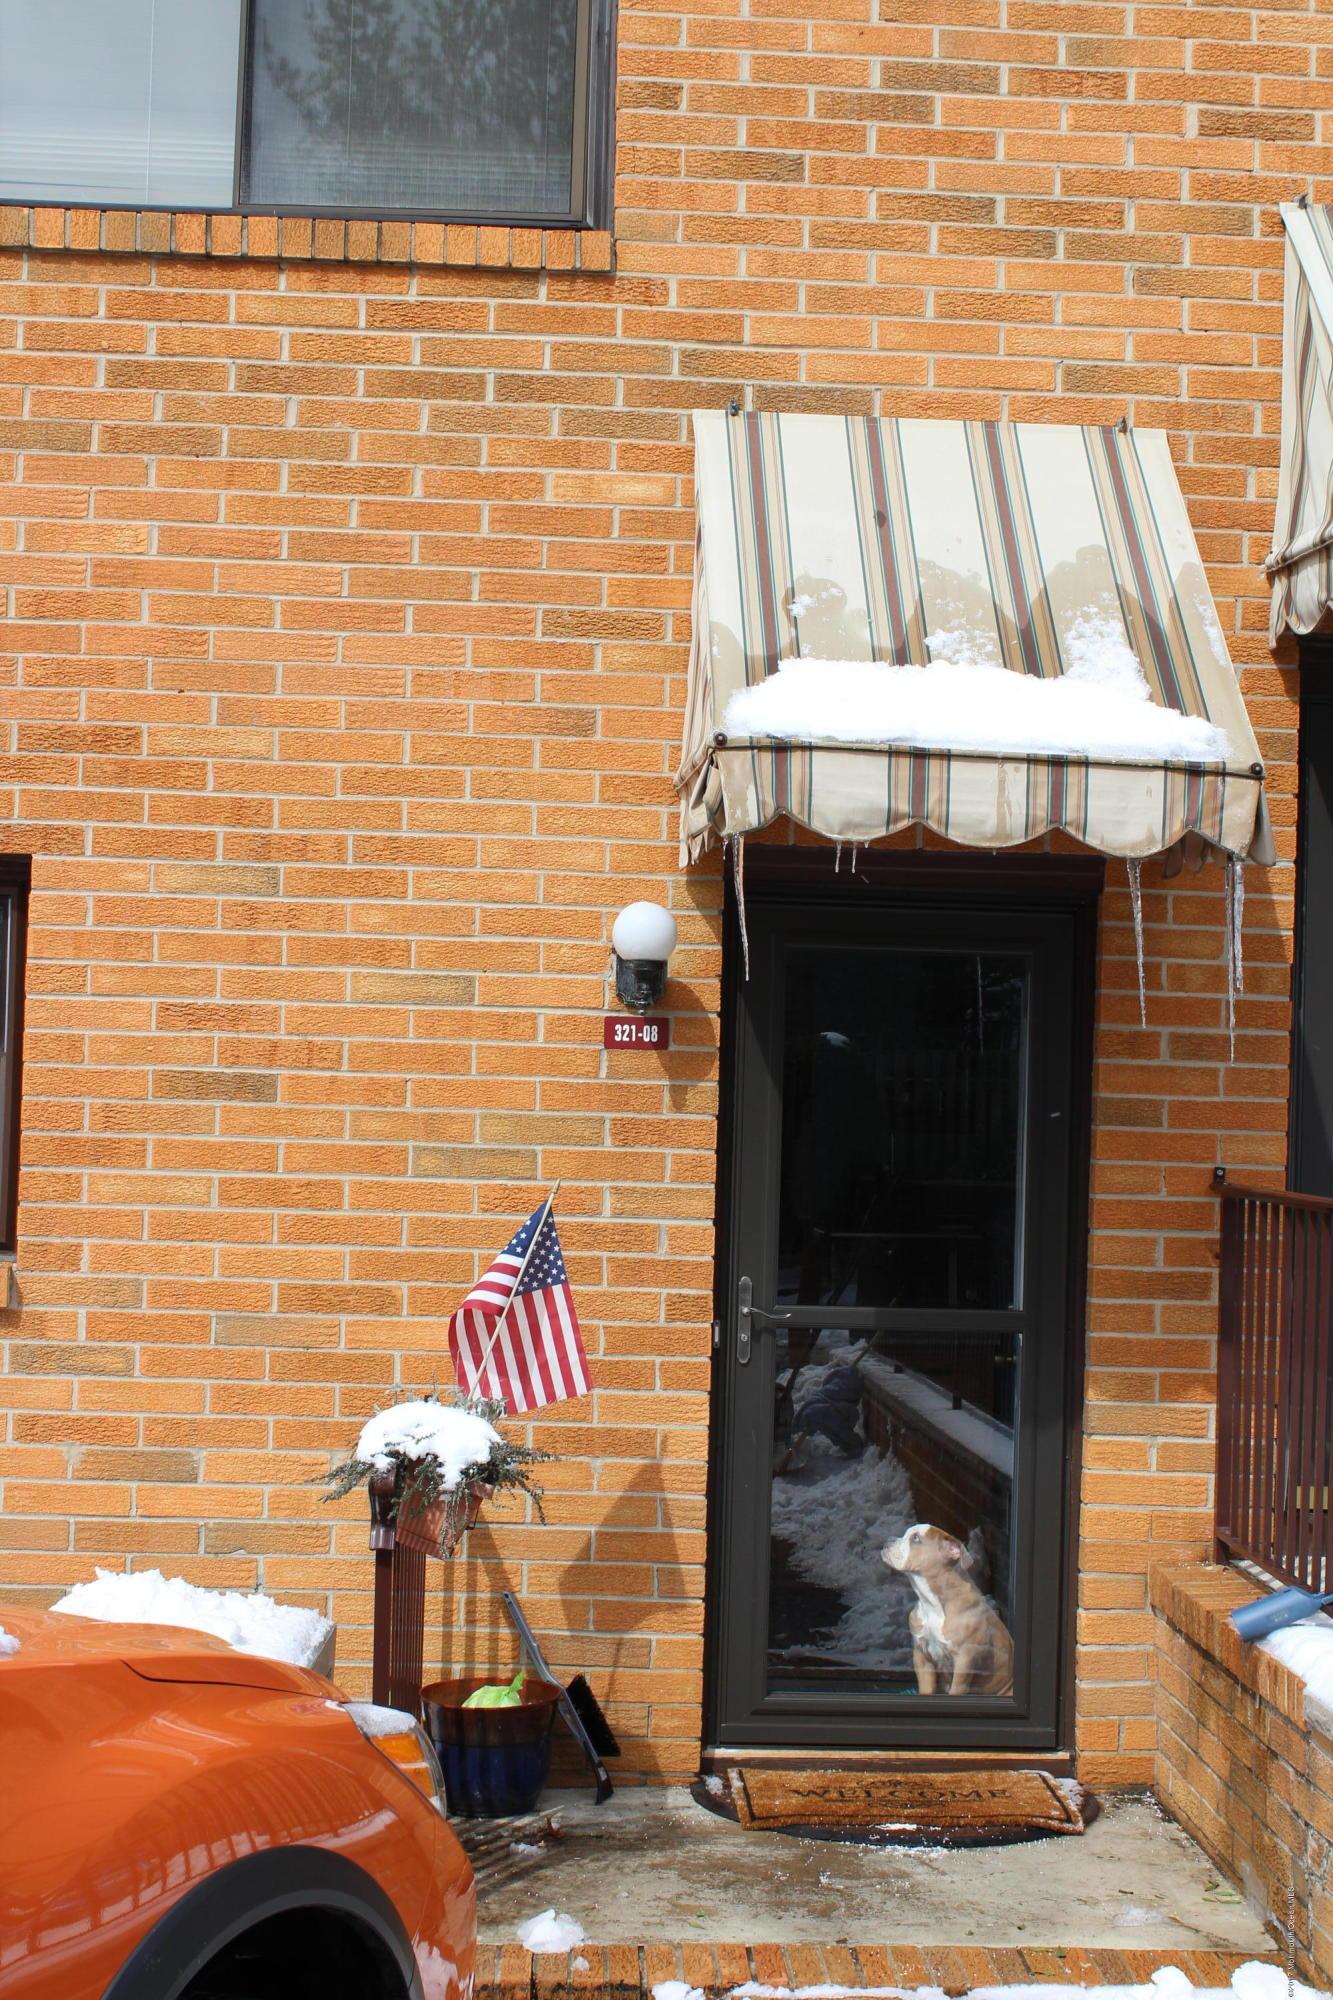 321 SPRING STREET #8, RED BANK, NJ 07701